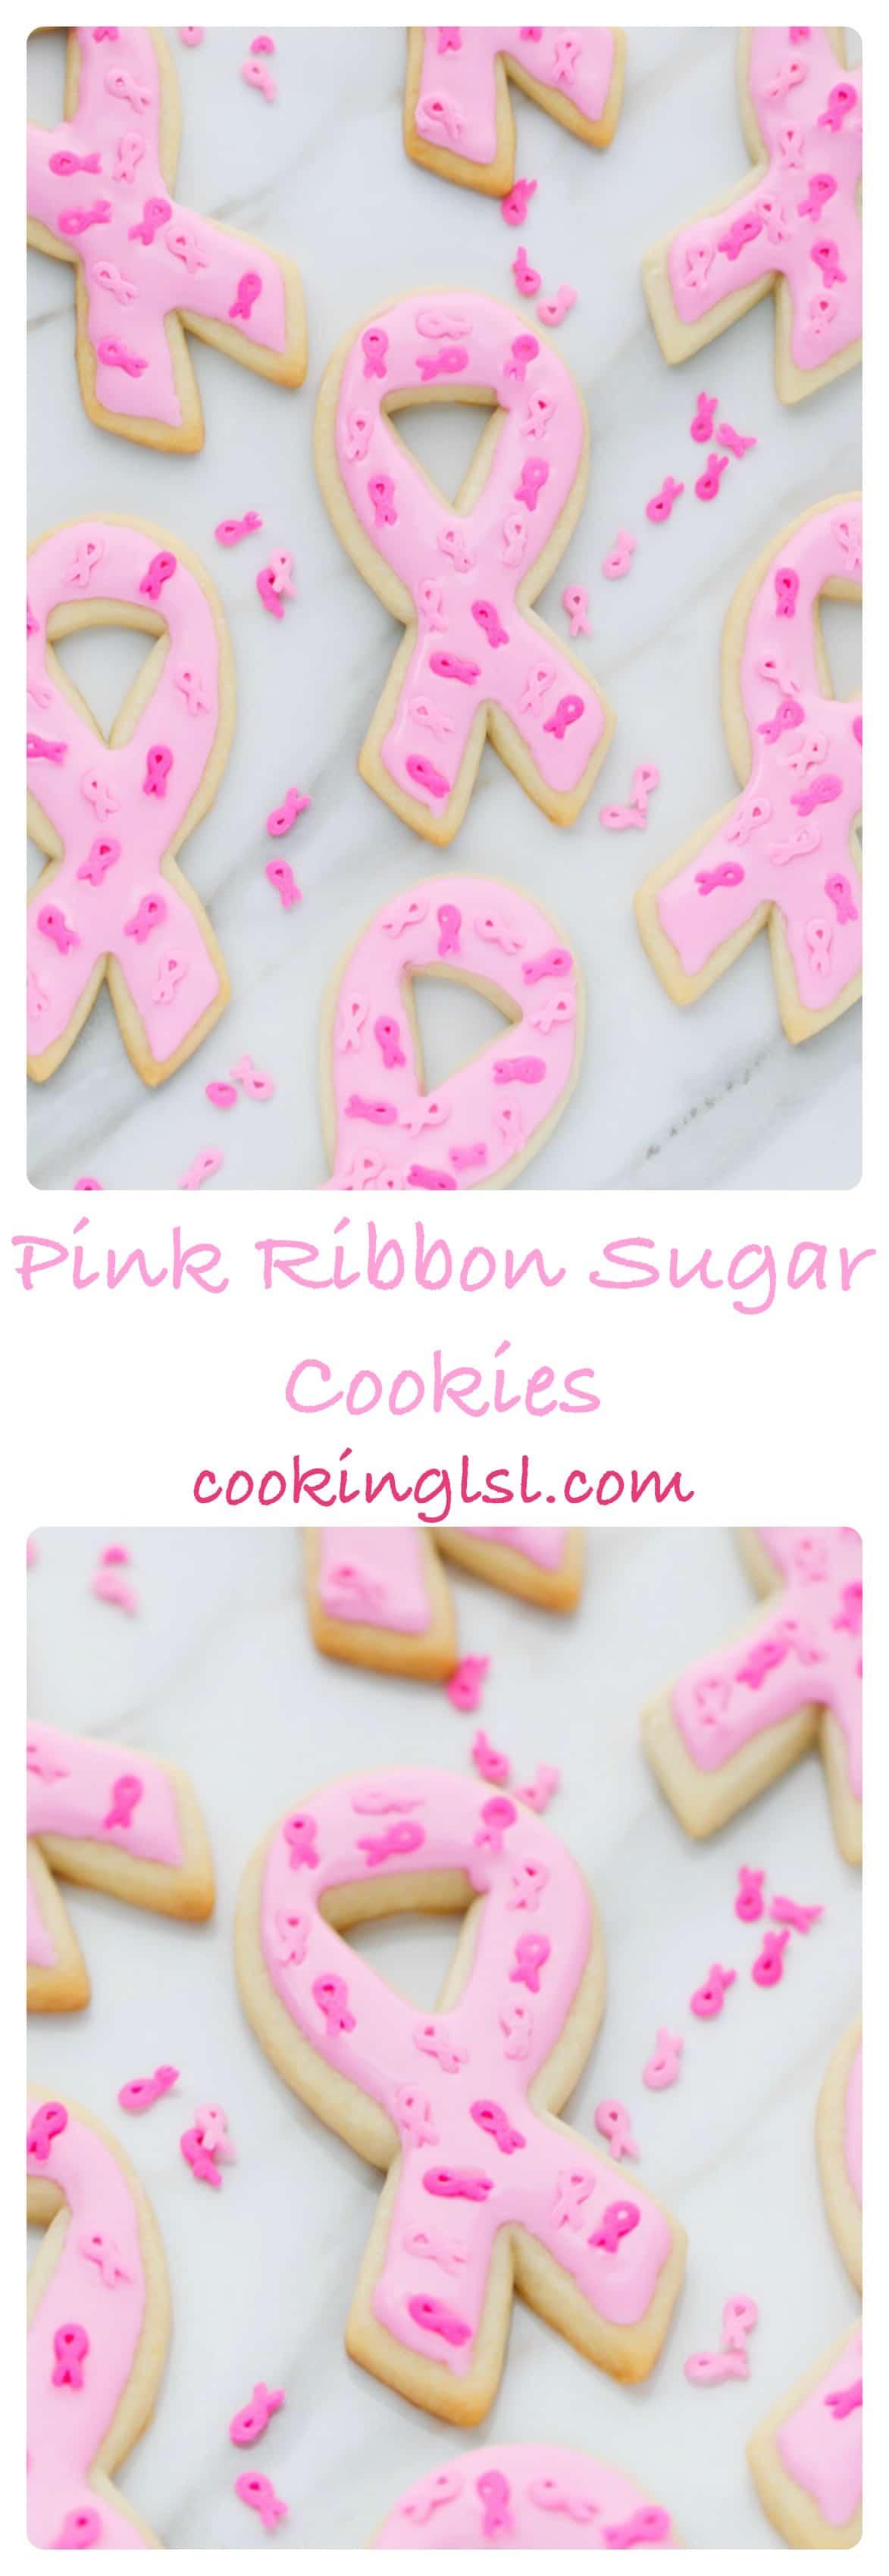 Pink-Ribbon-Sugar-Cookies -Breast-Cancer-Awareness